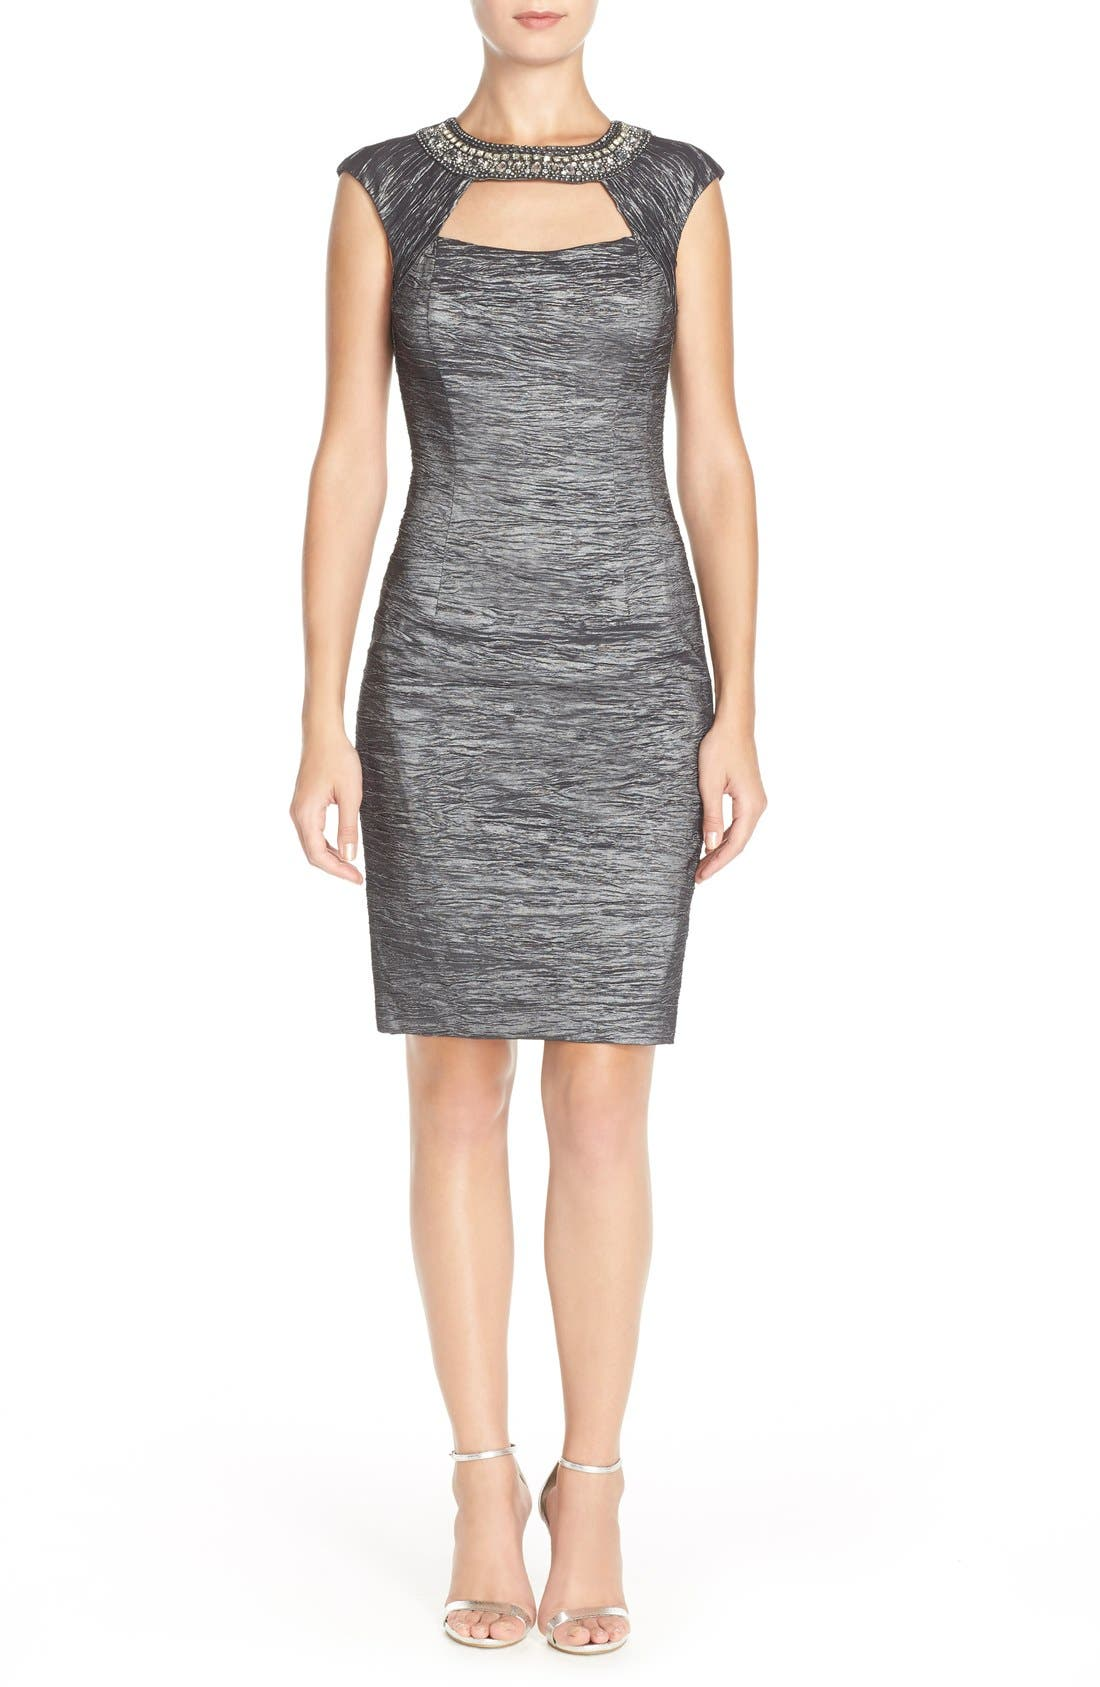 Embellished Crushed Taffeta Sheath Dress,                         Main,                         color, 023